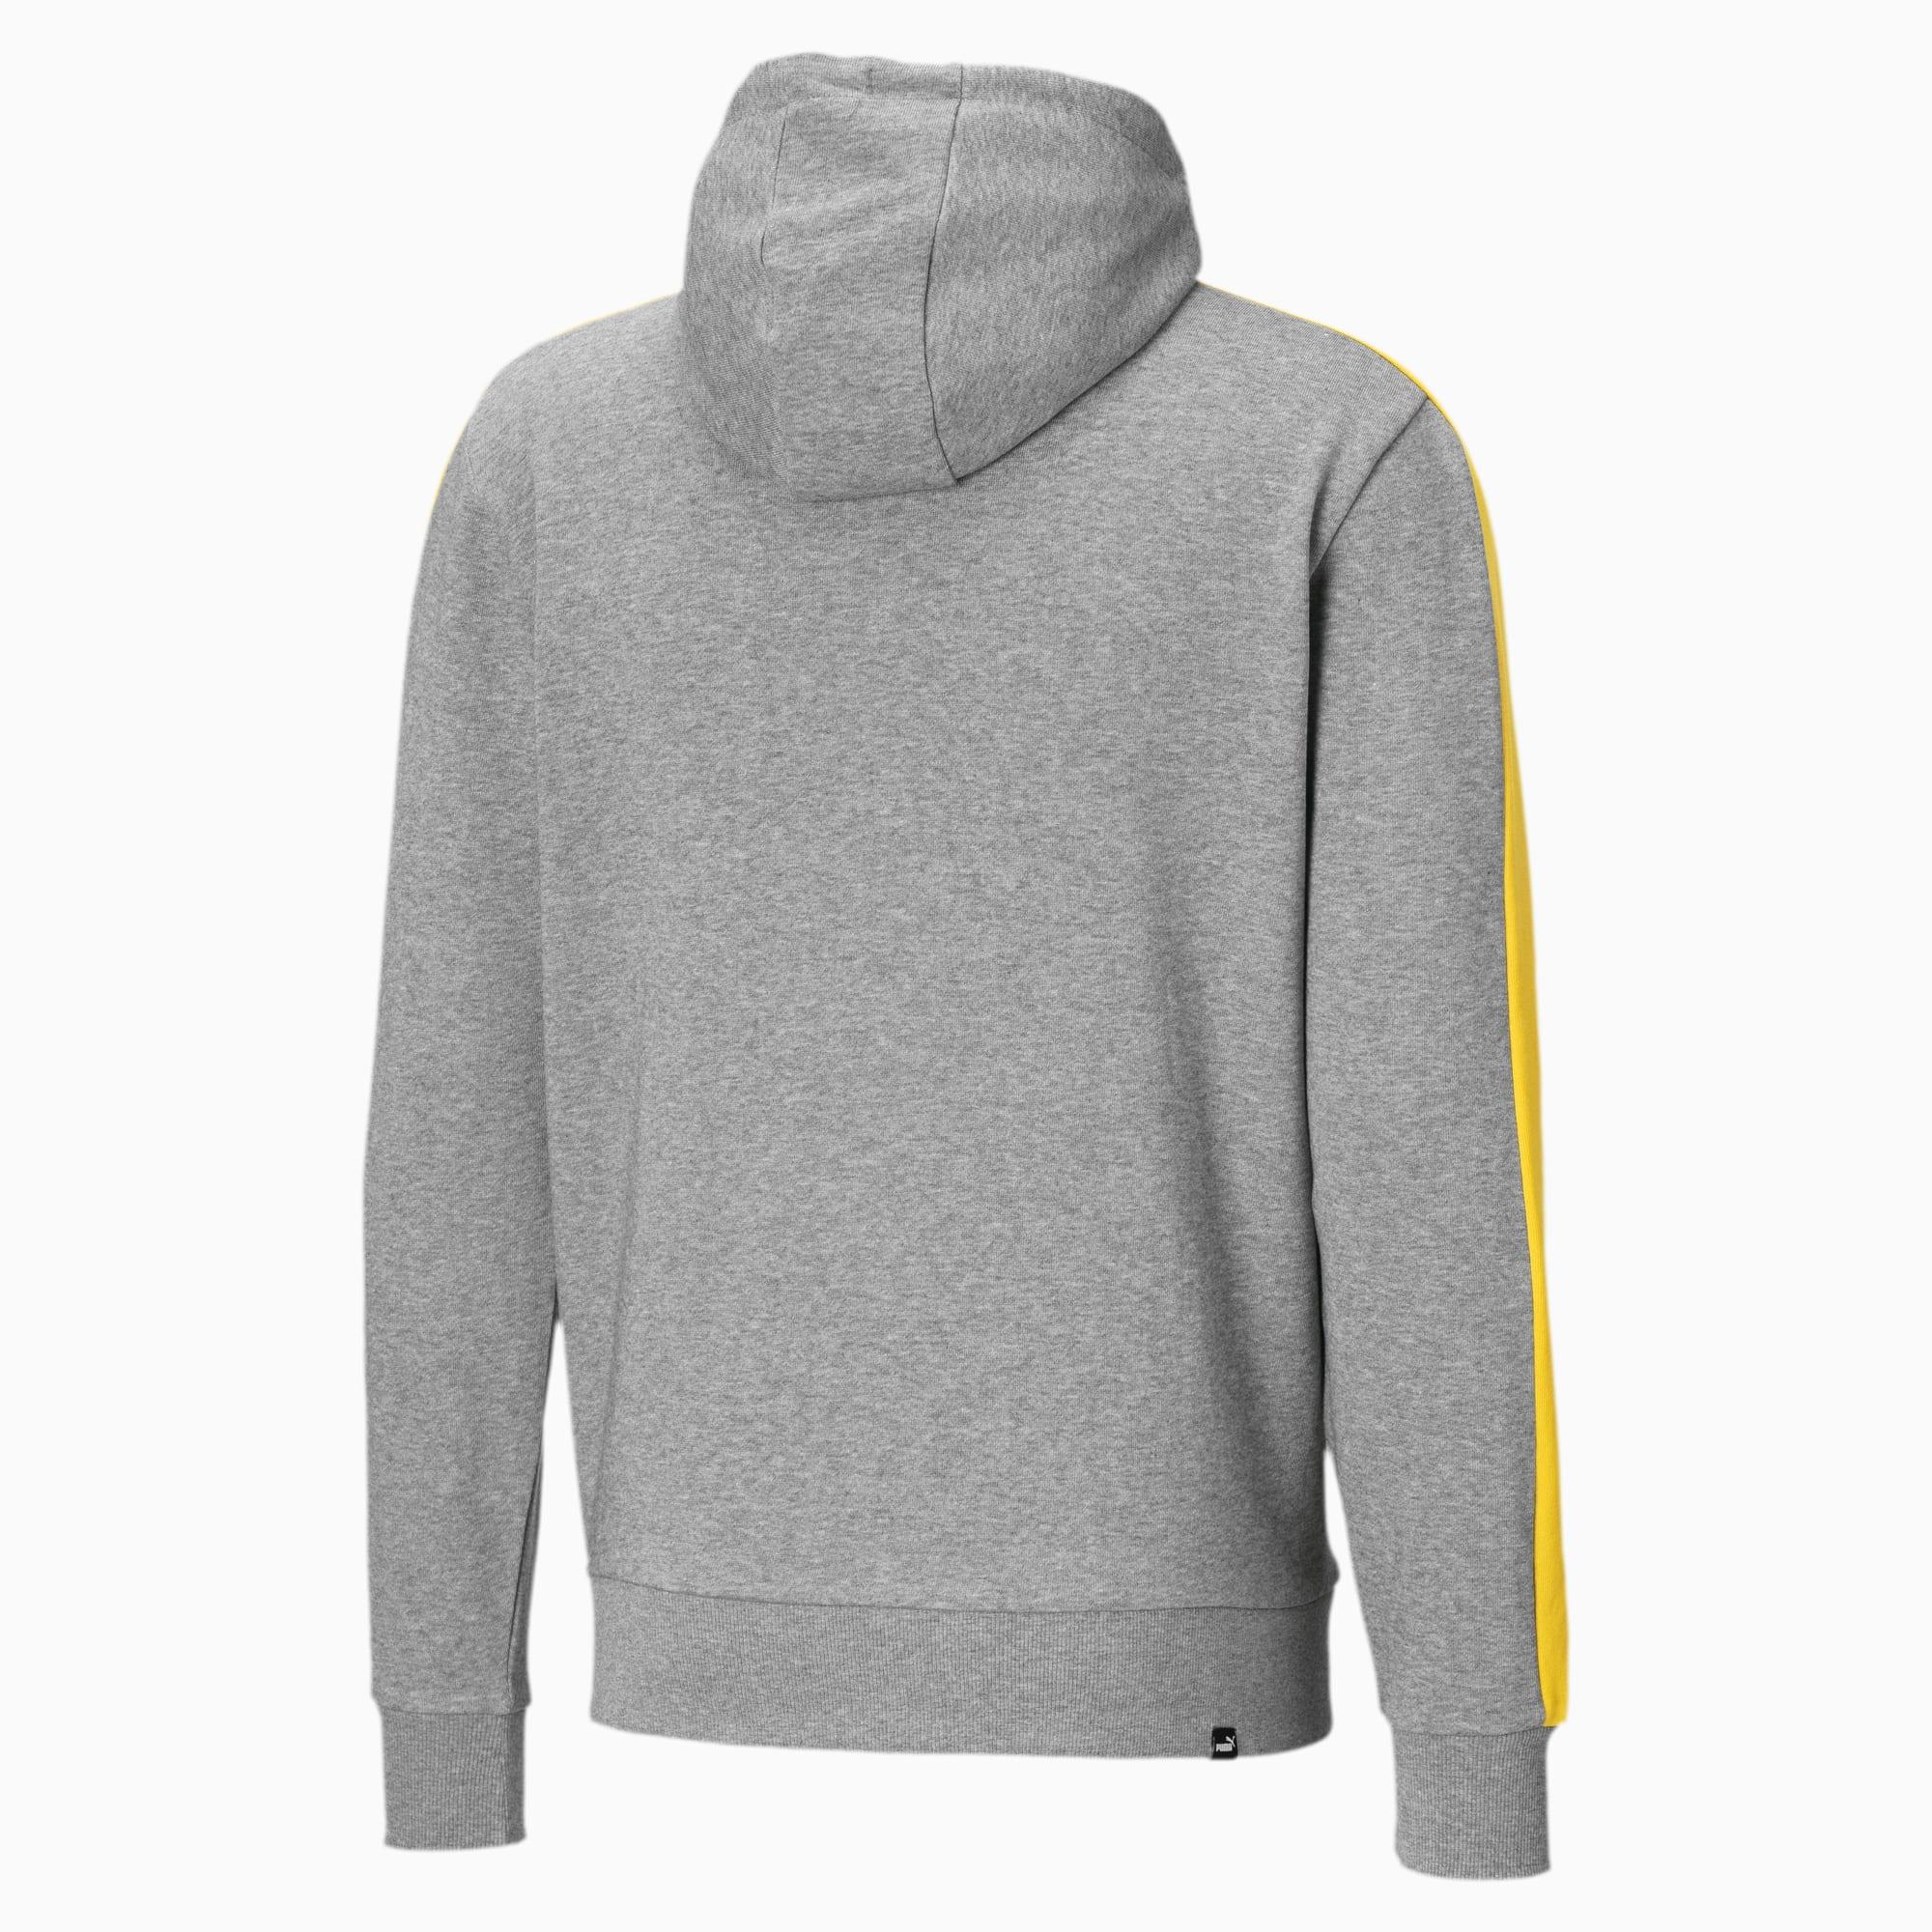 Puma Hoodie, Logo Design, Kontrast Kapuze, für Herren grau